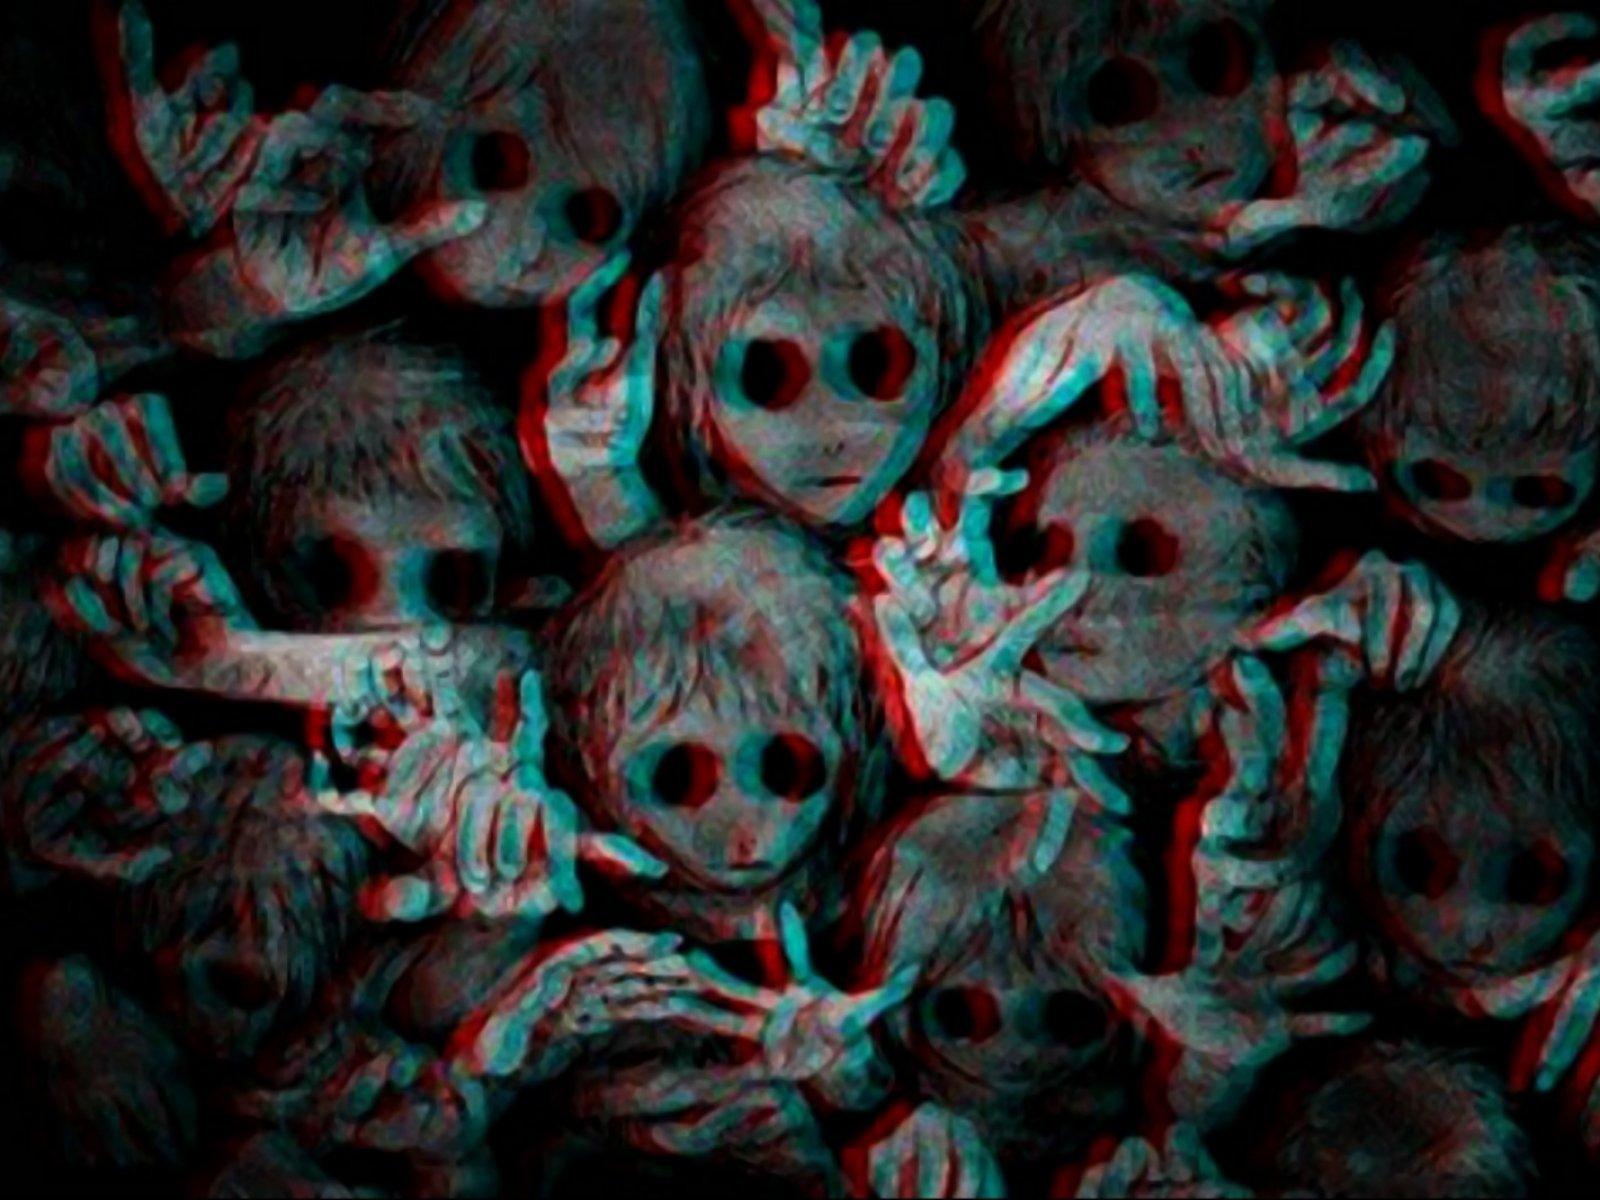 Wallpaper 1600x1200 Px Art Artwork Creepy Dark Evil